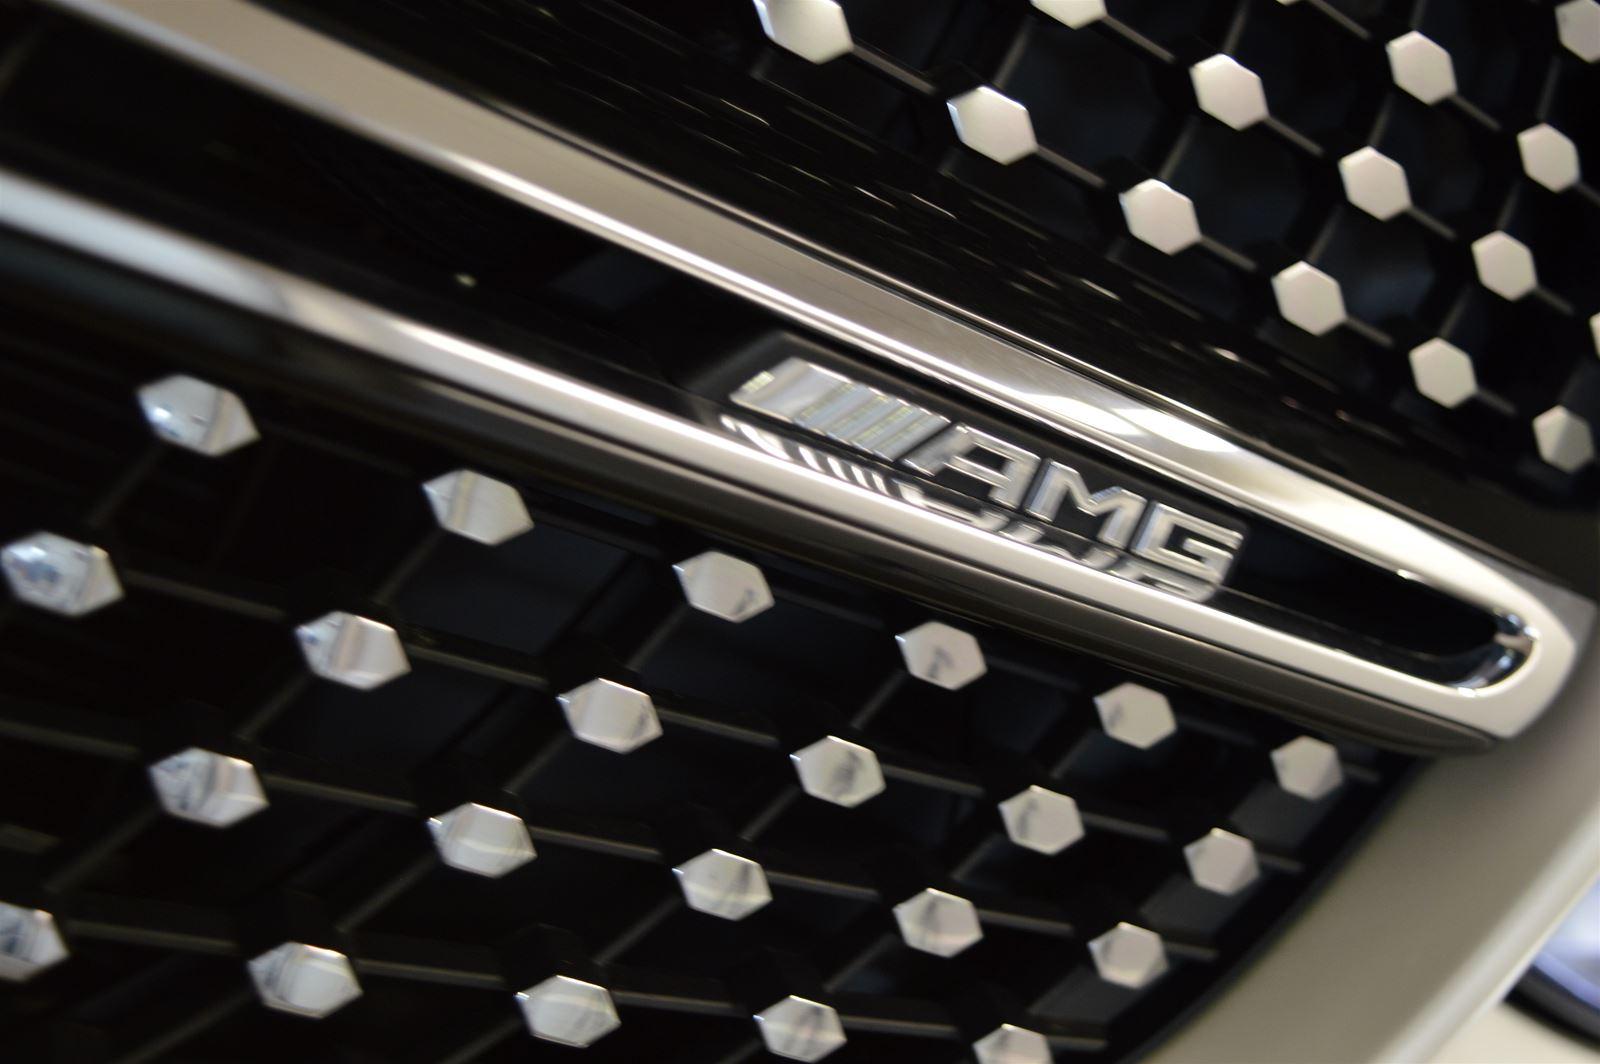 MERCEDES-BENZ GLC 43 AMG 4 MATIC